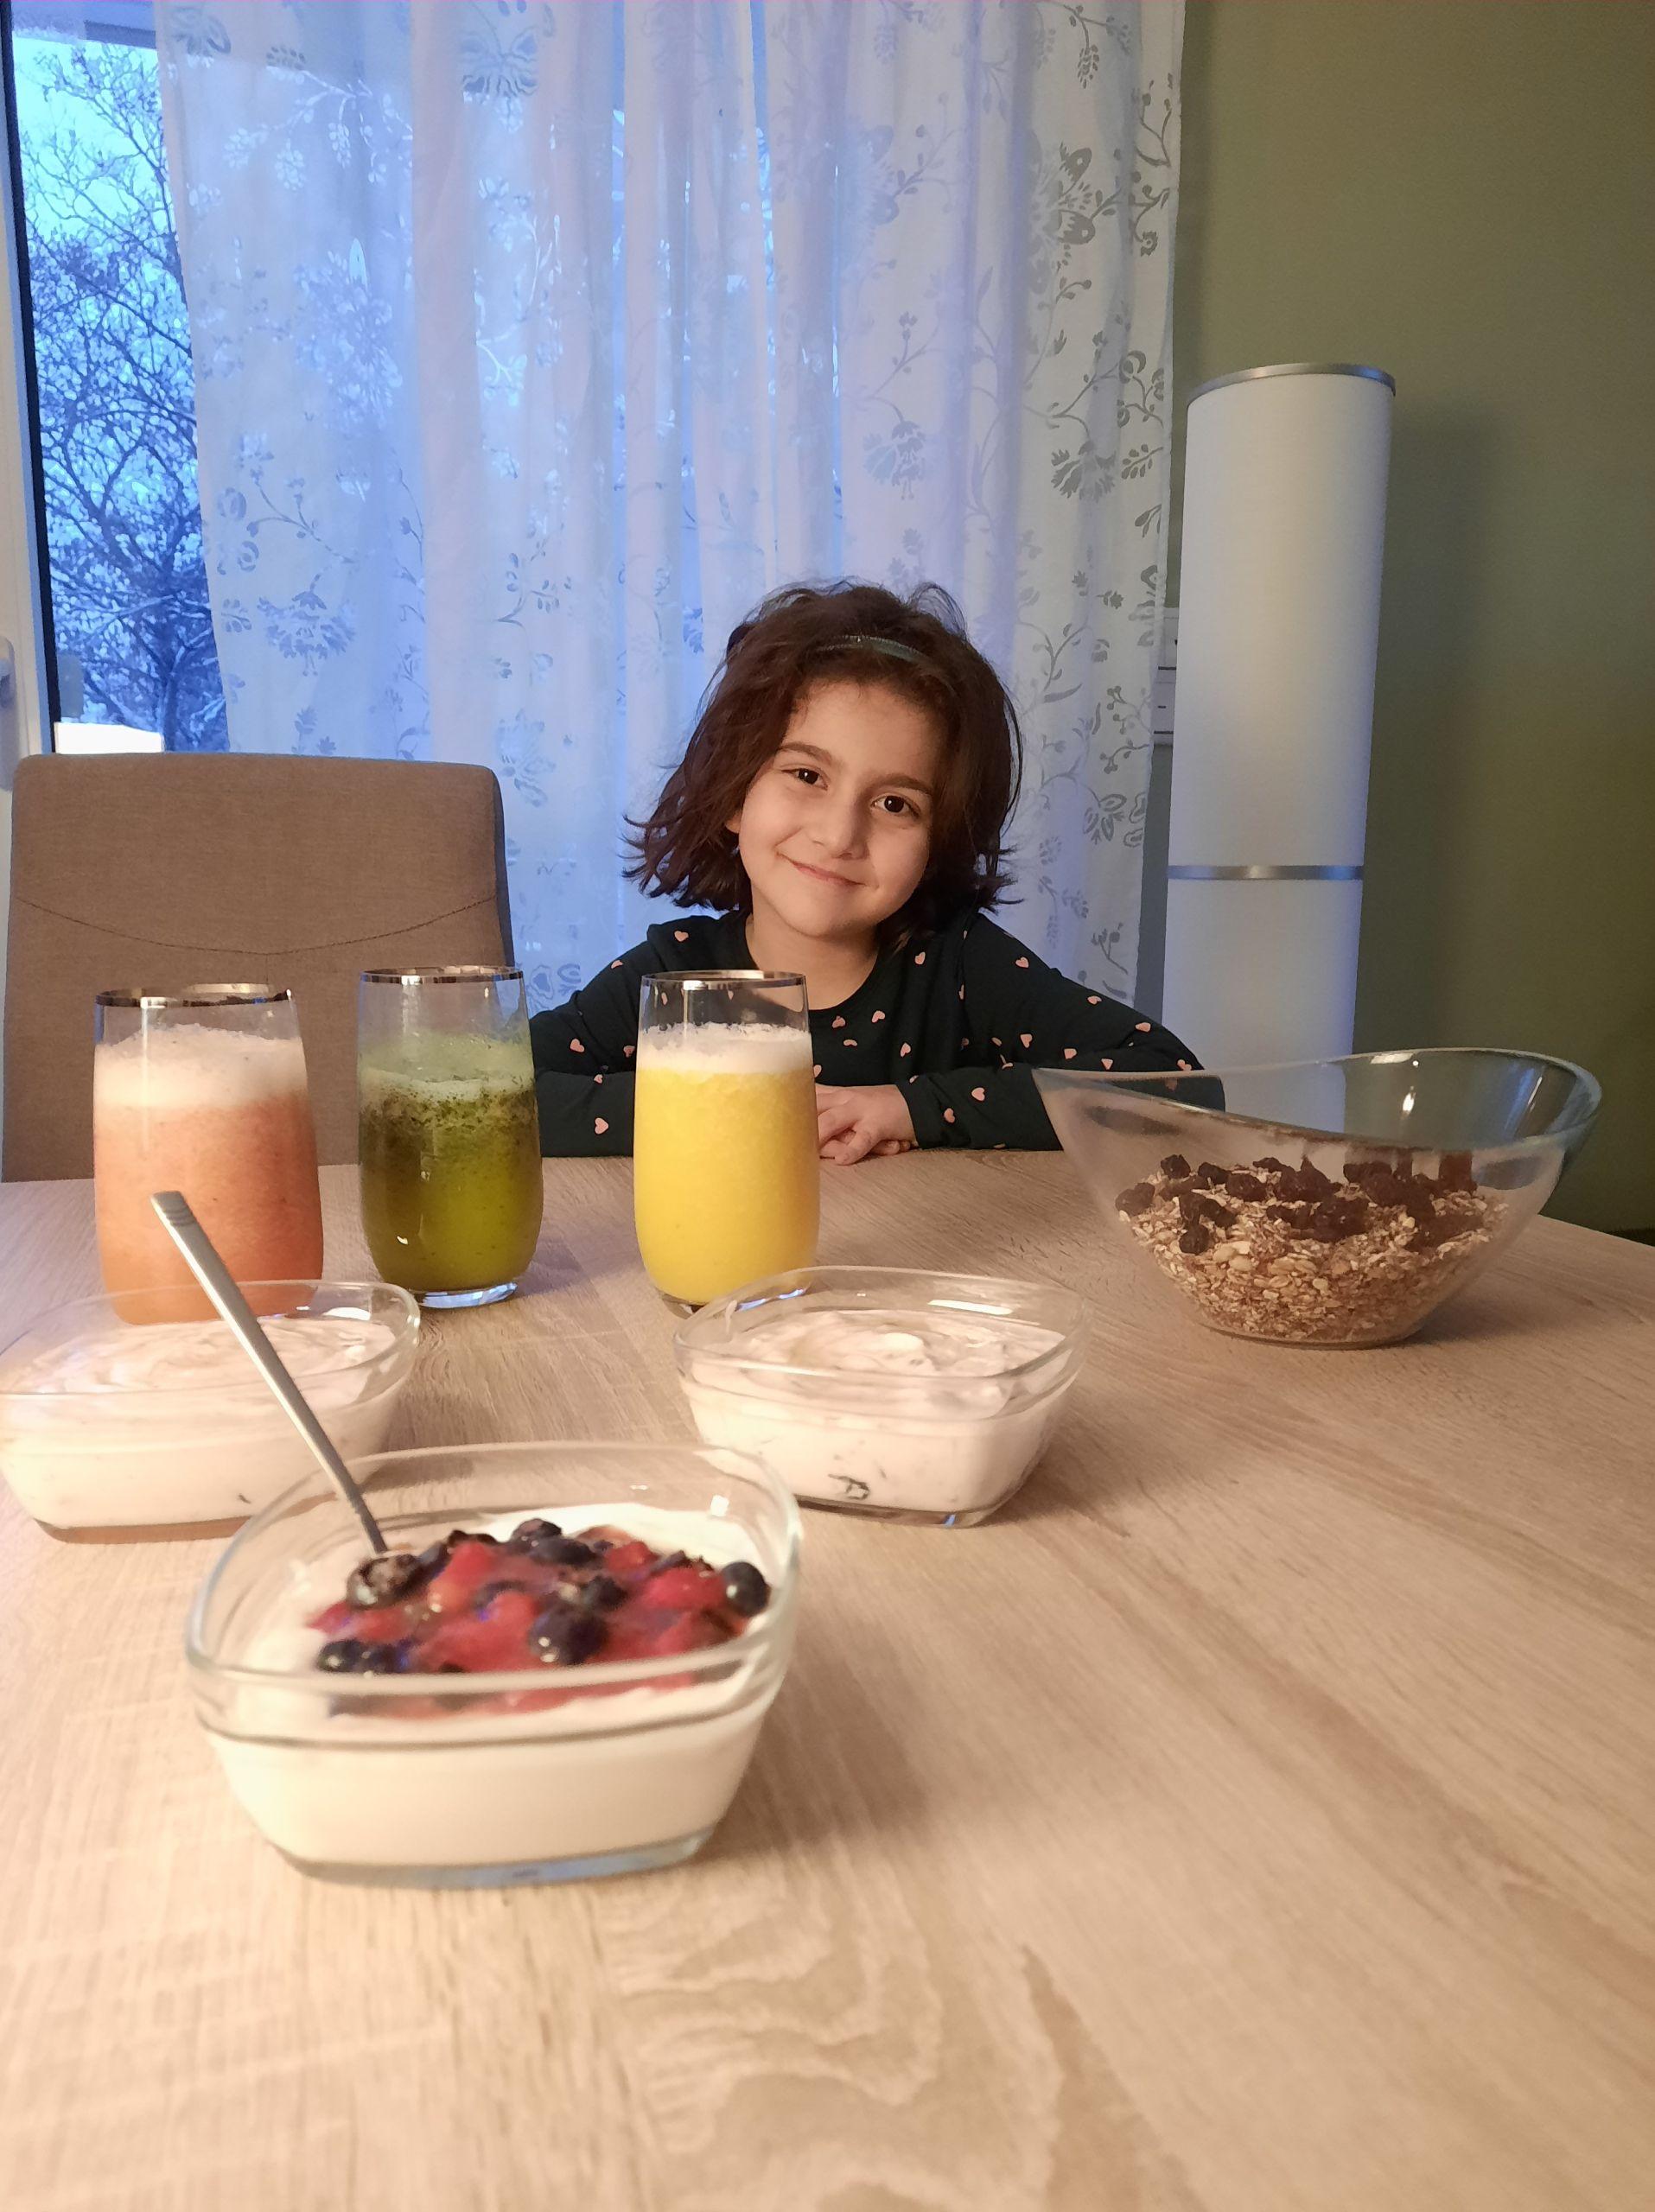 Stolze Köchin von Kinder-Kochkurs.com